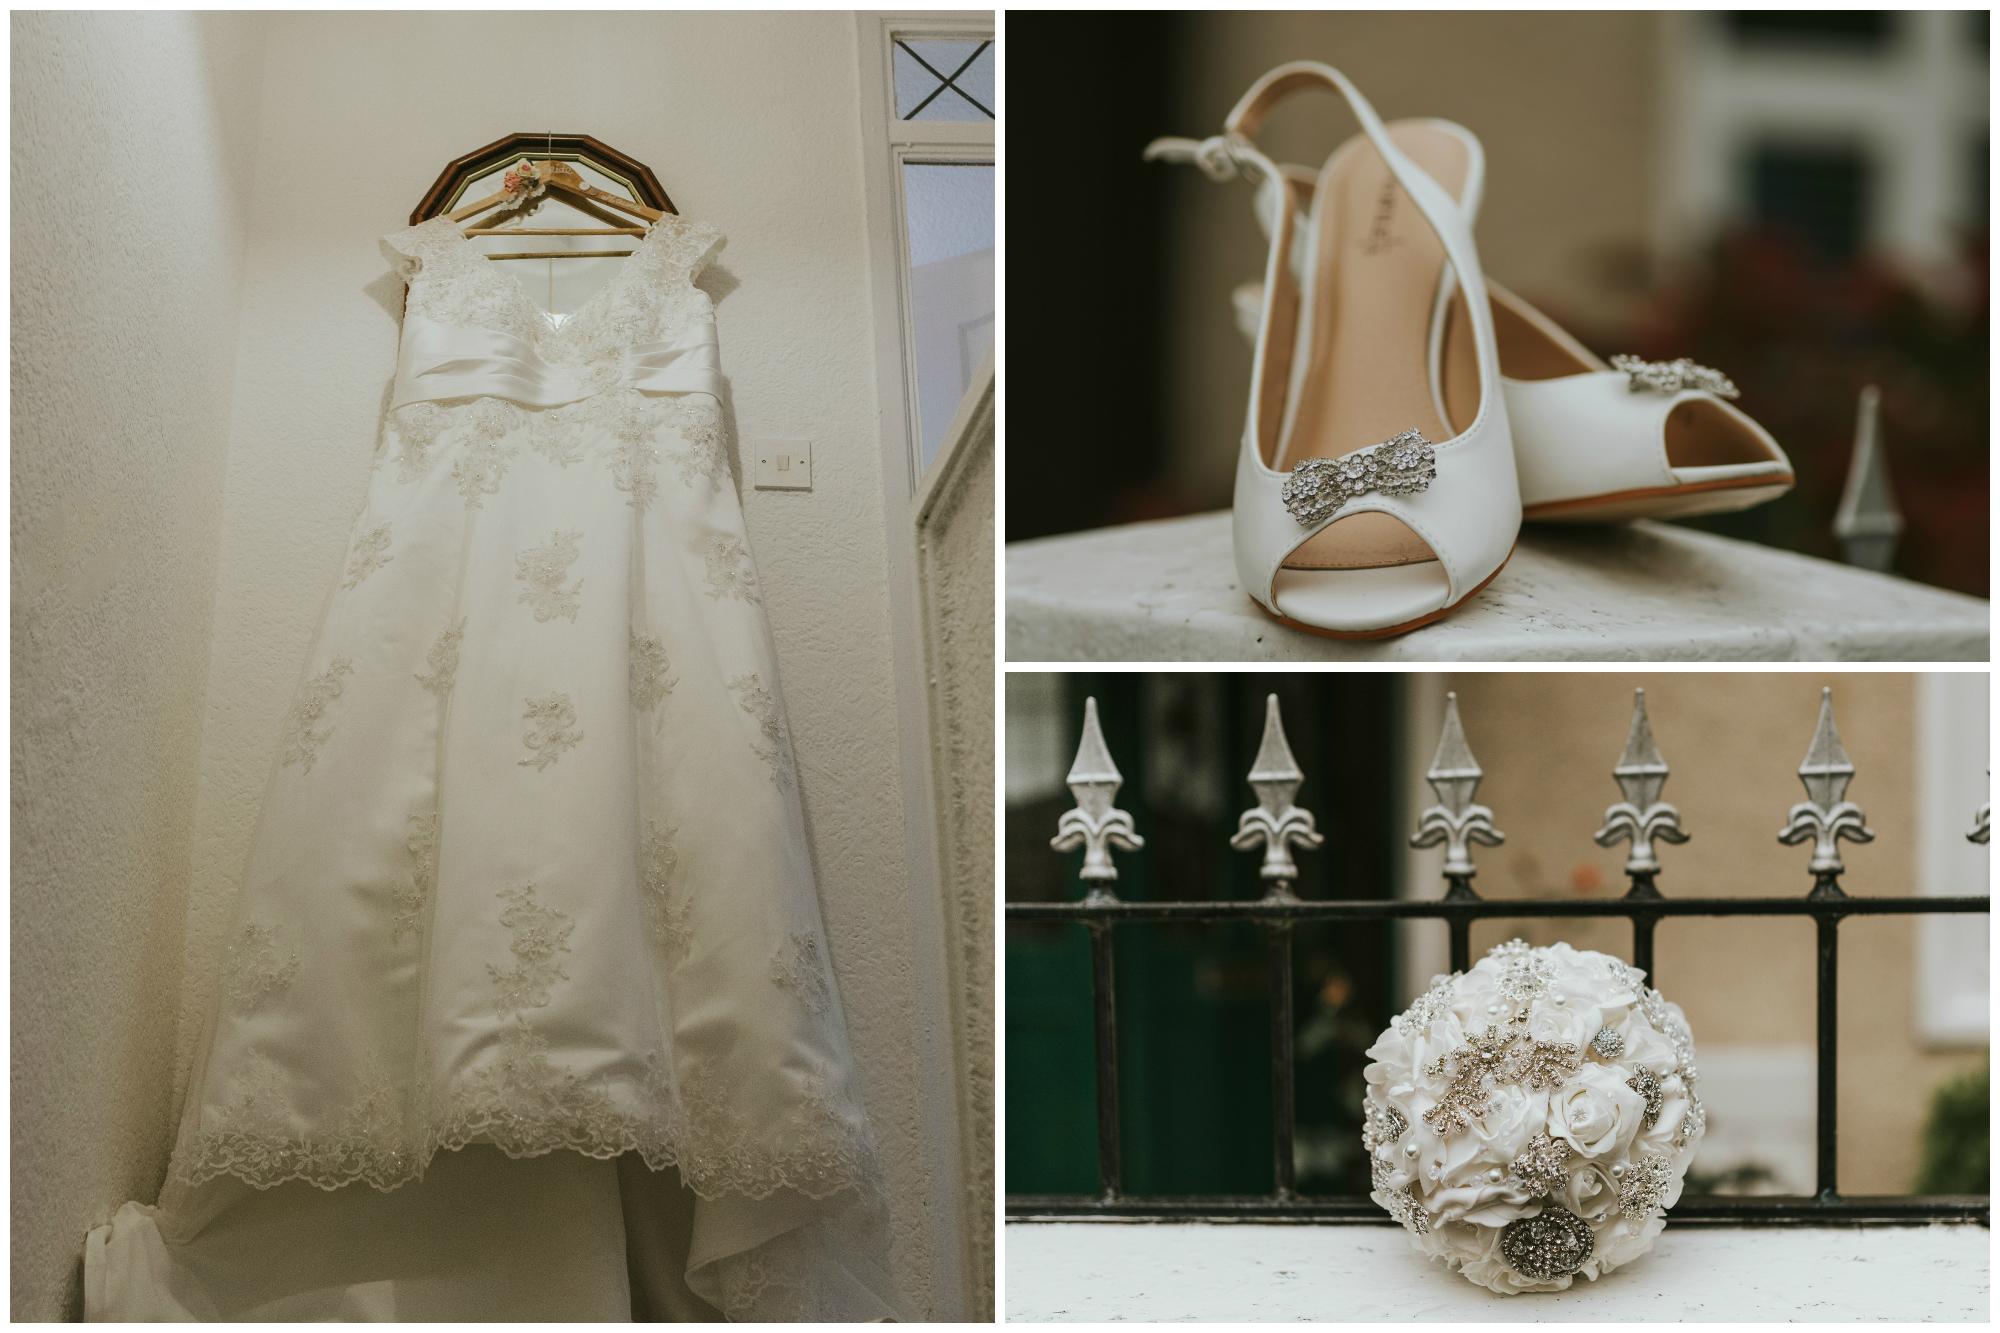 belfast wedding photographer pure photo n.i brides shoes dress flowers